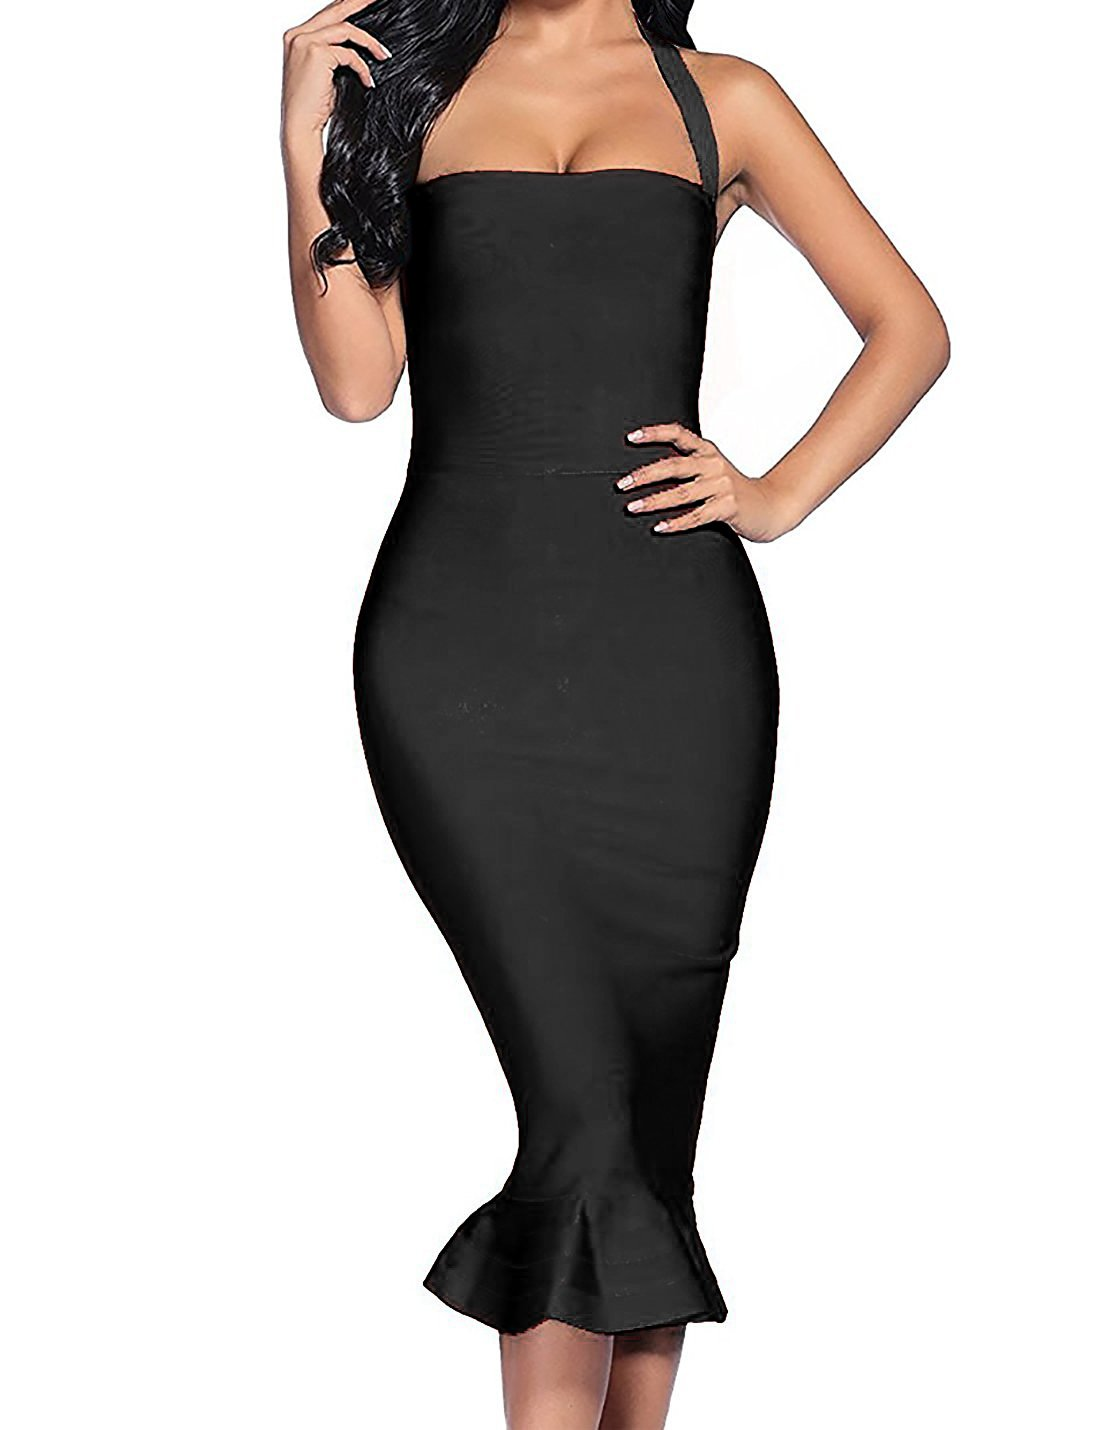 houstil Women's Bandage Dress Sexy Halter Fishtail Bodycon Party Club Dress (S, Black)